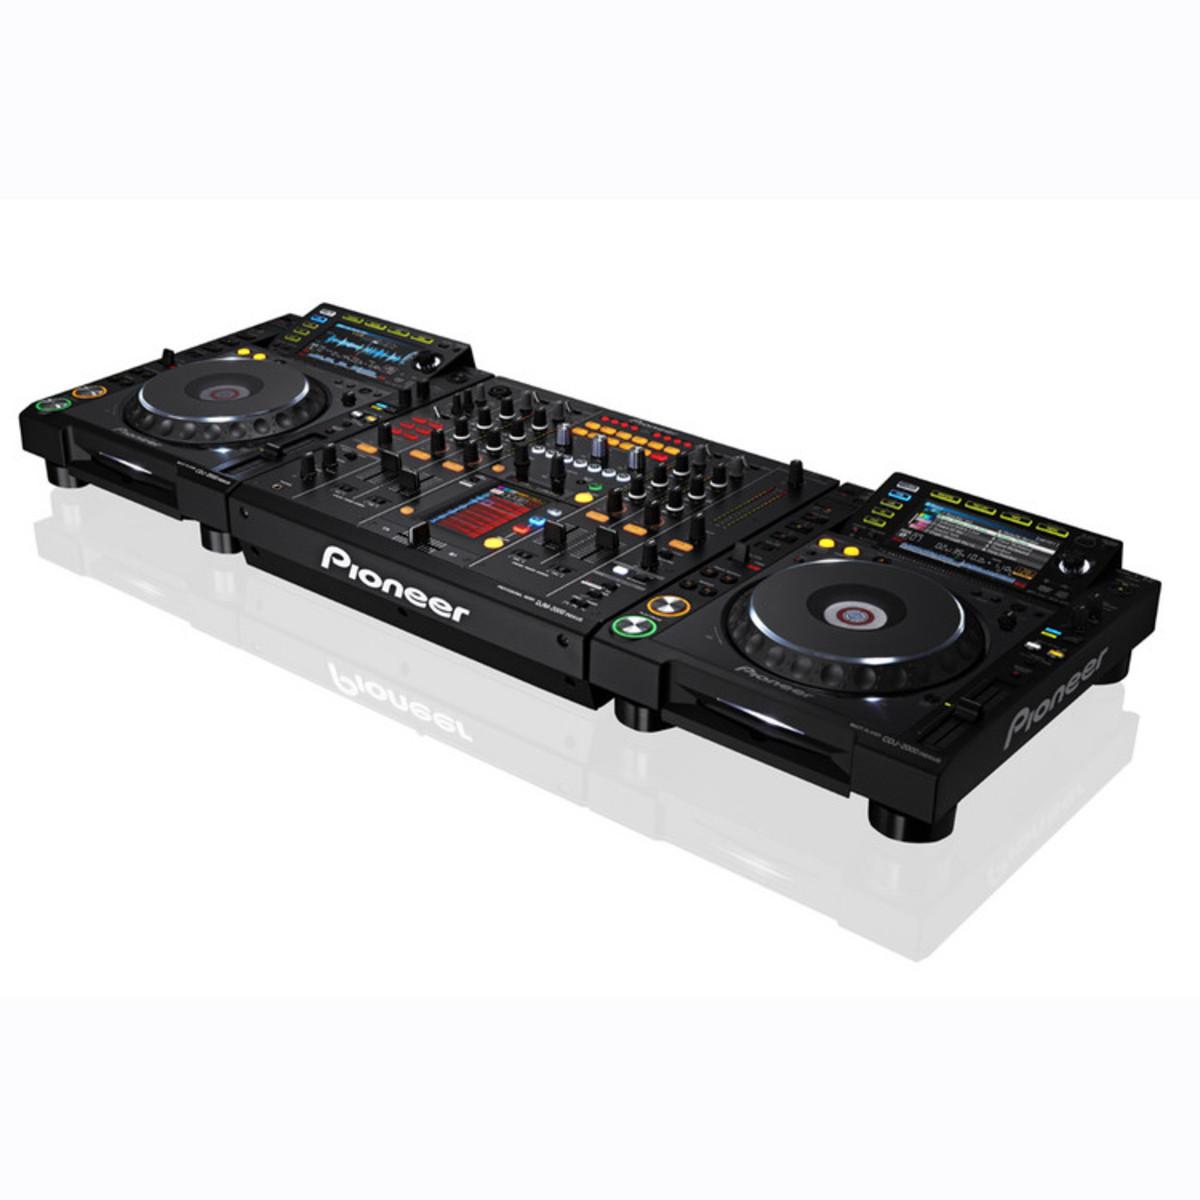 pioneer djm 2000 nexus 4 channel digital effects mixer at. Black Bedroom Furniture Sets. Home Design Ideas